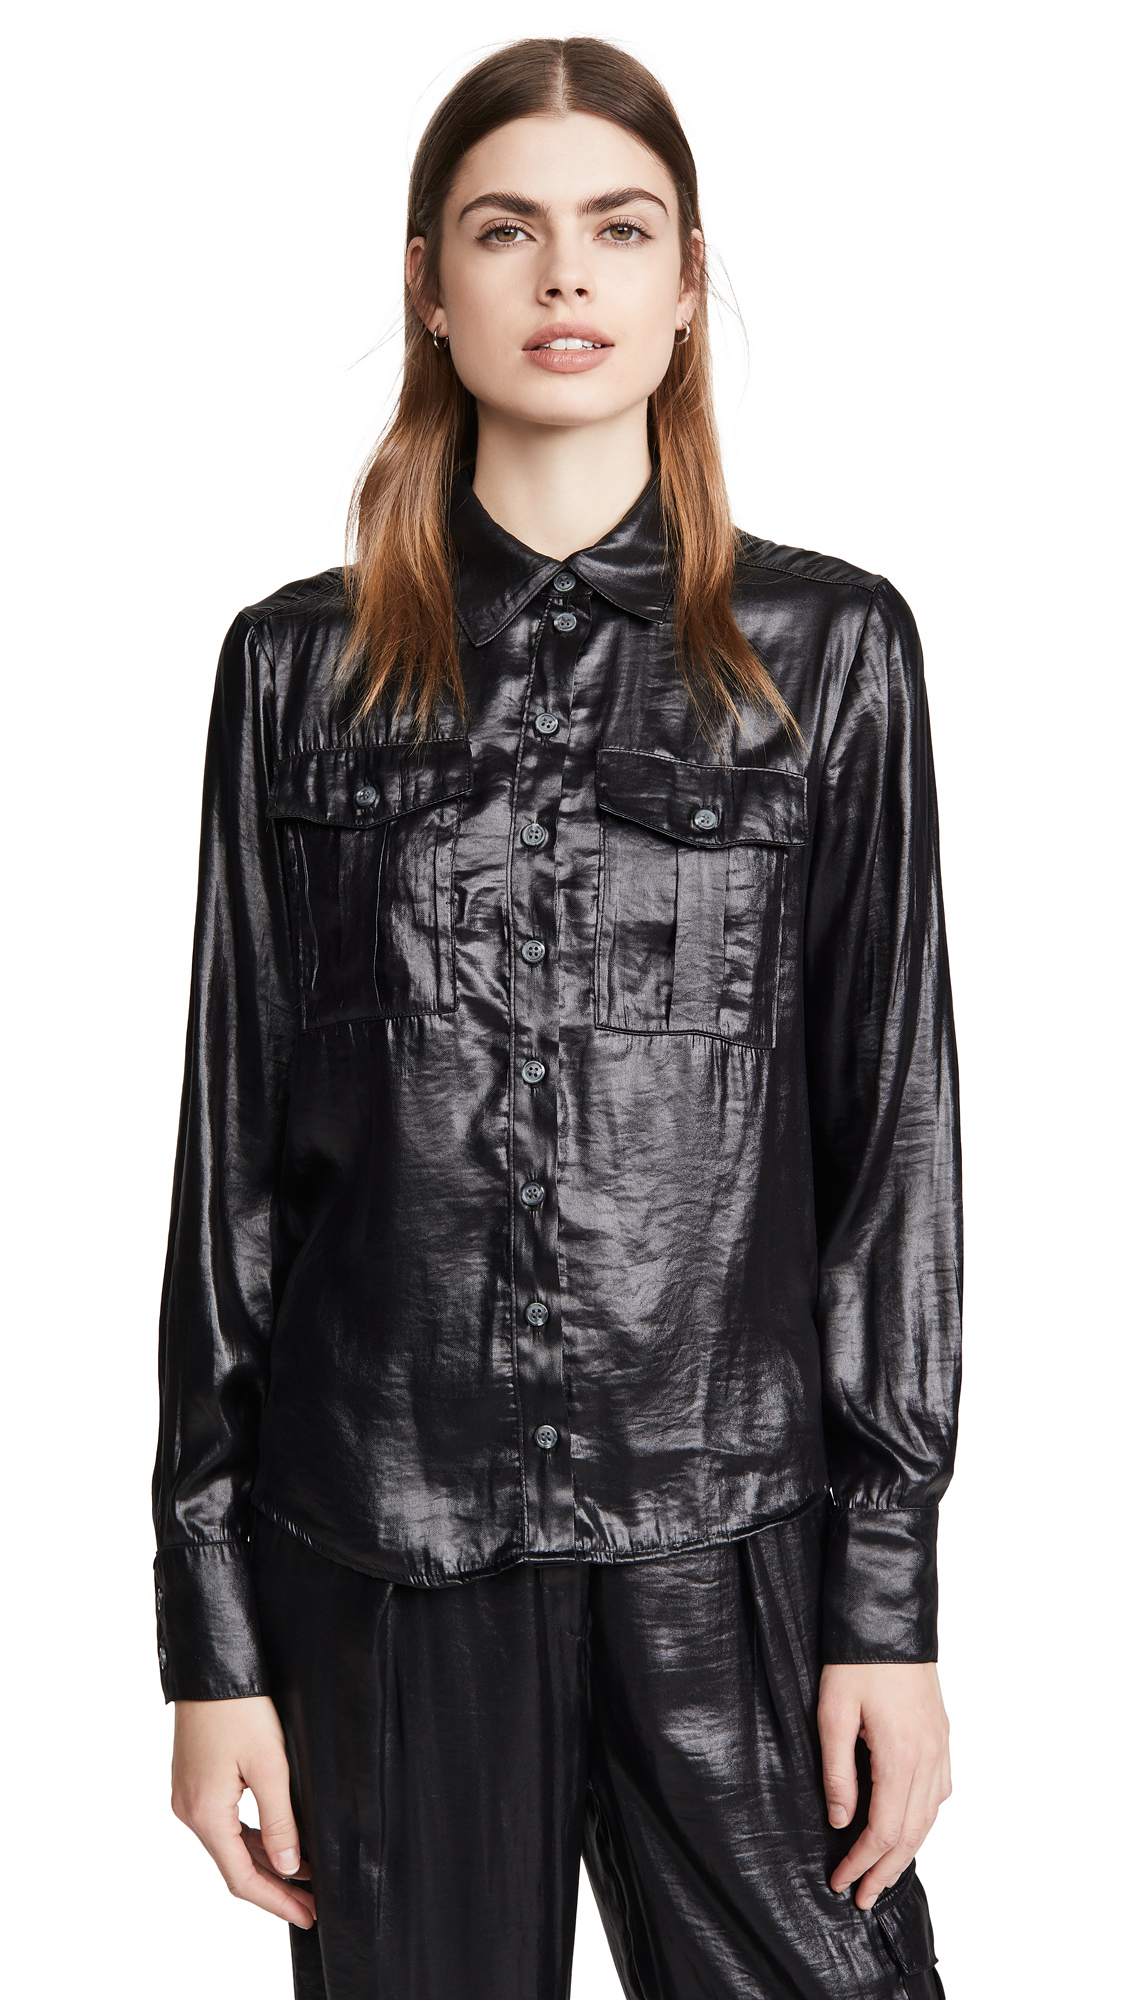 The Range Lucid Satin Military Shirt - 30% Off Sale